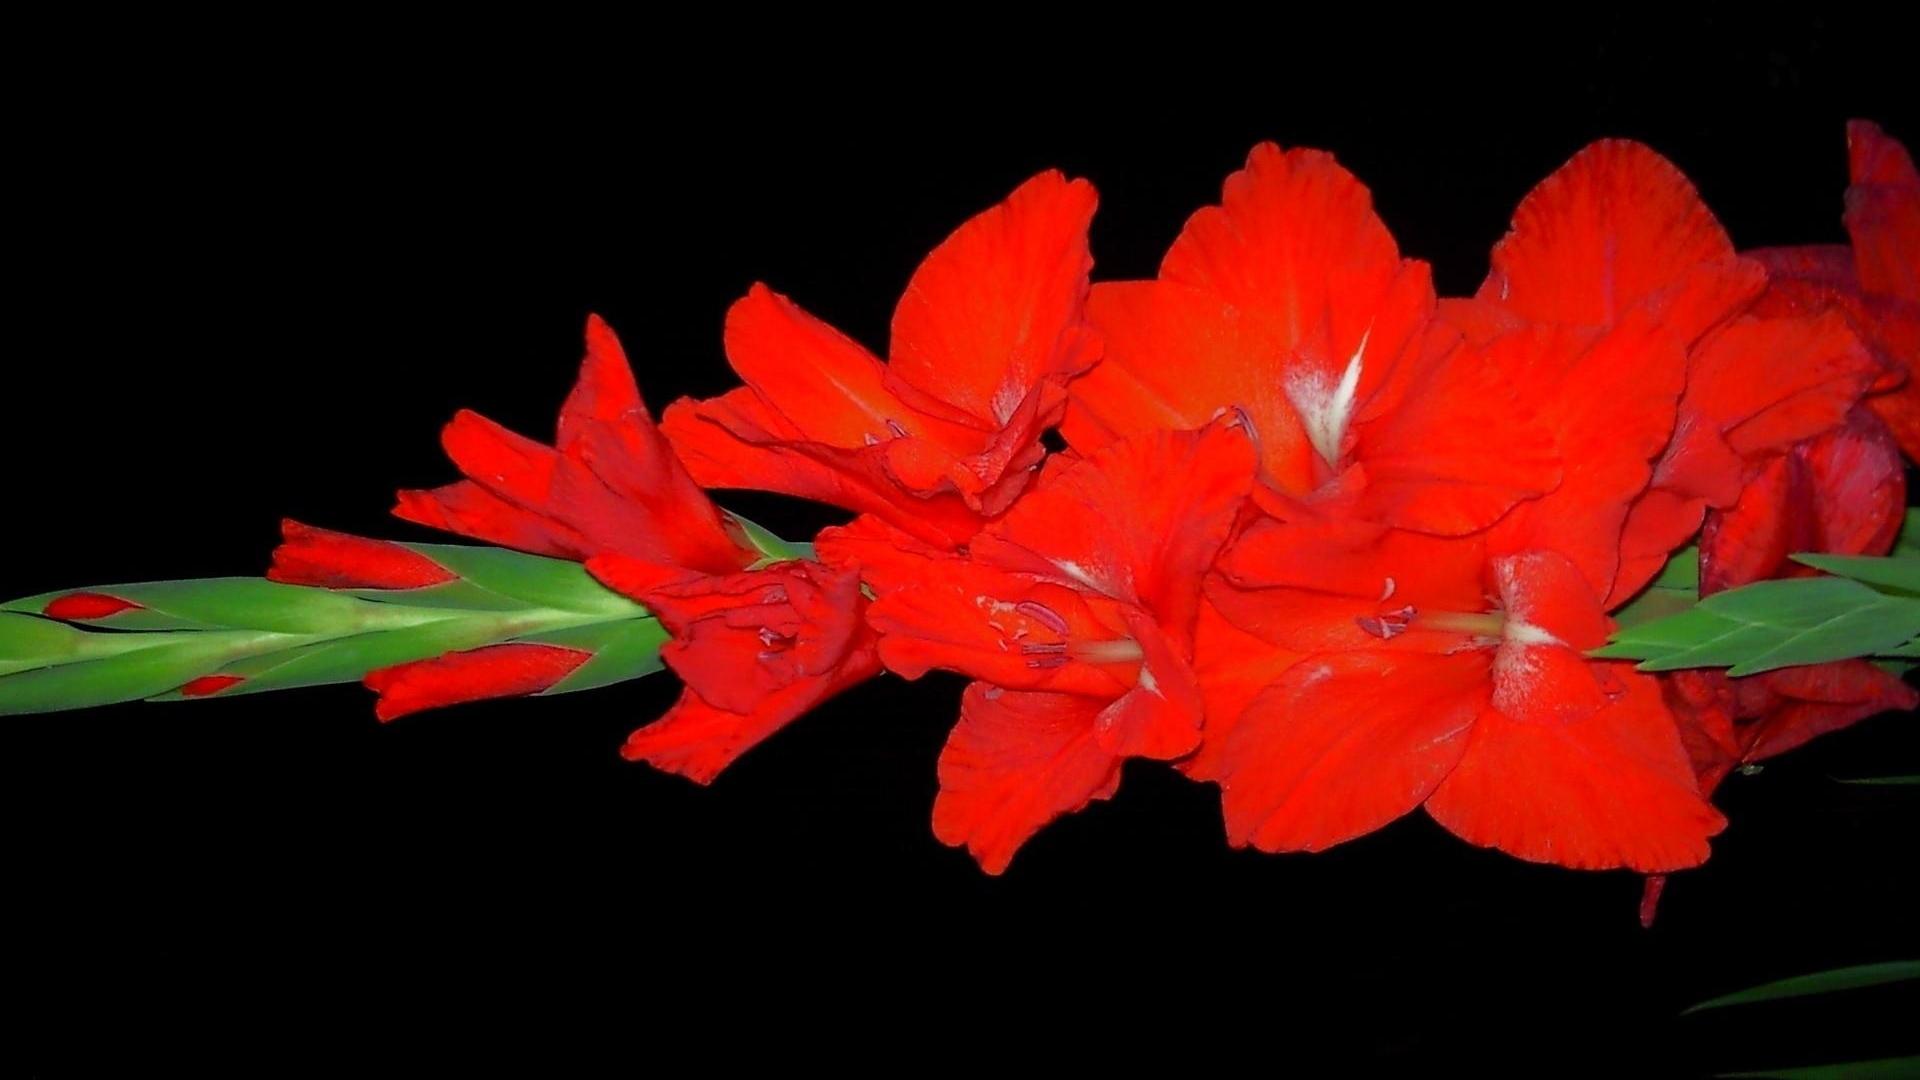 Download Wallpaper 1920x1080 gladiolus, flower, bright, black ...